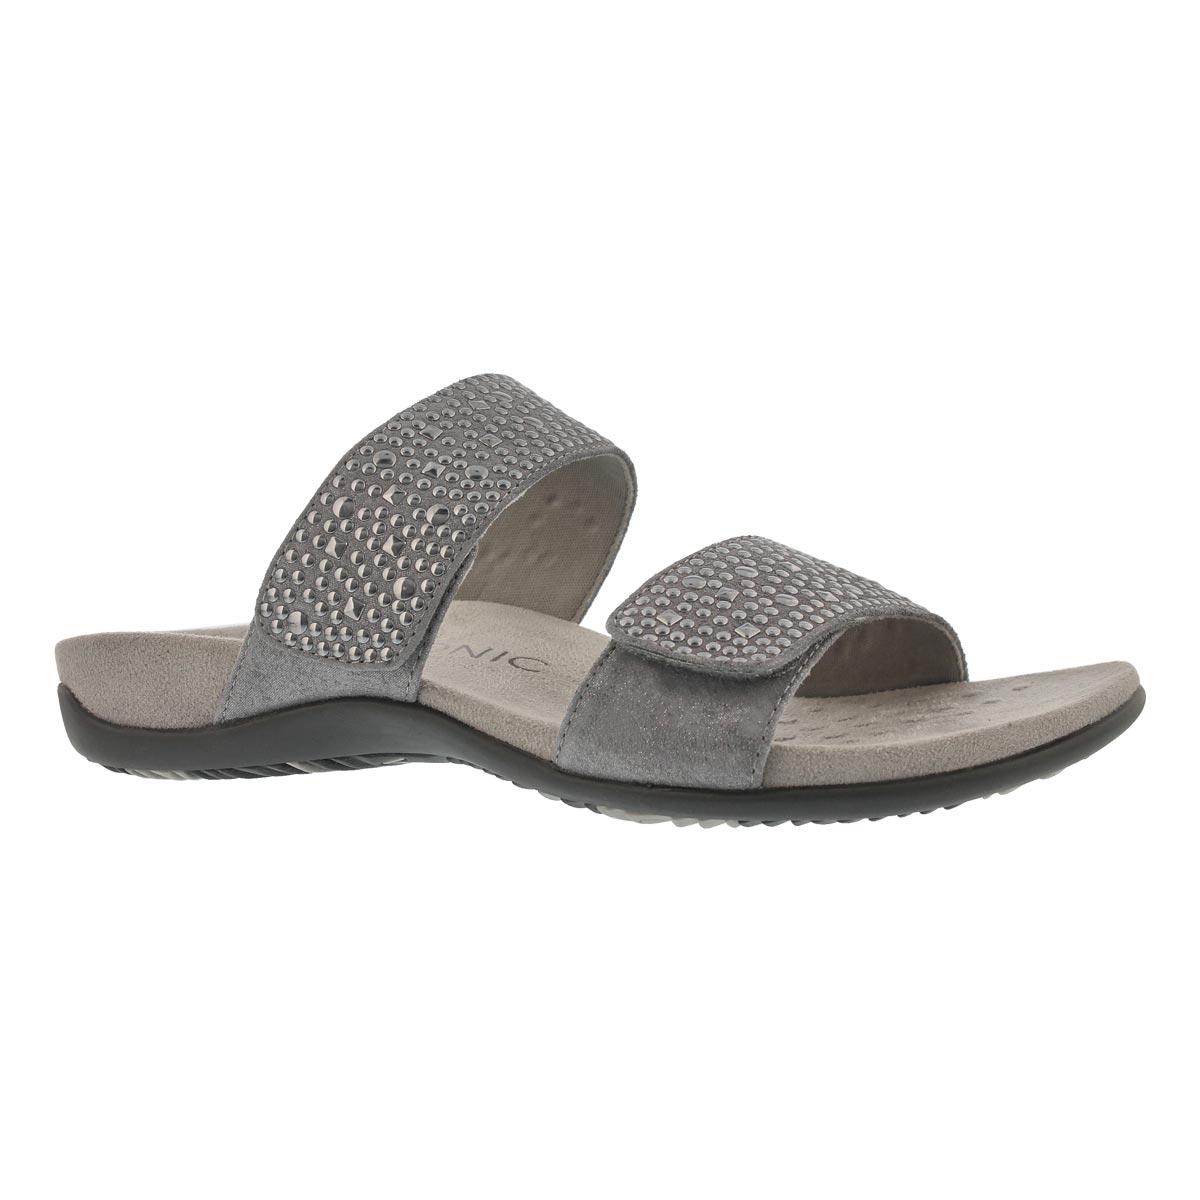 Women's SAMOA pewter arch support slide sandals